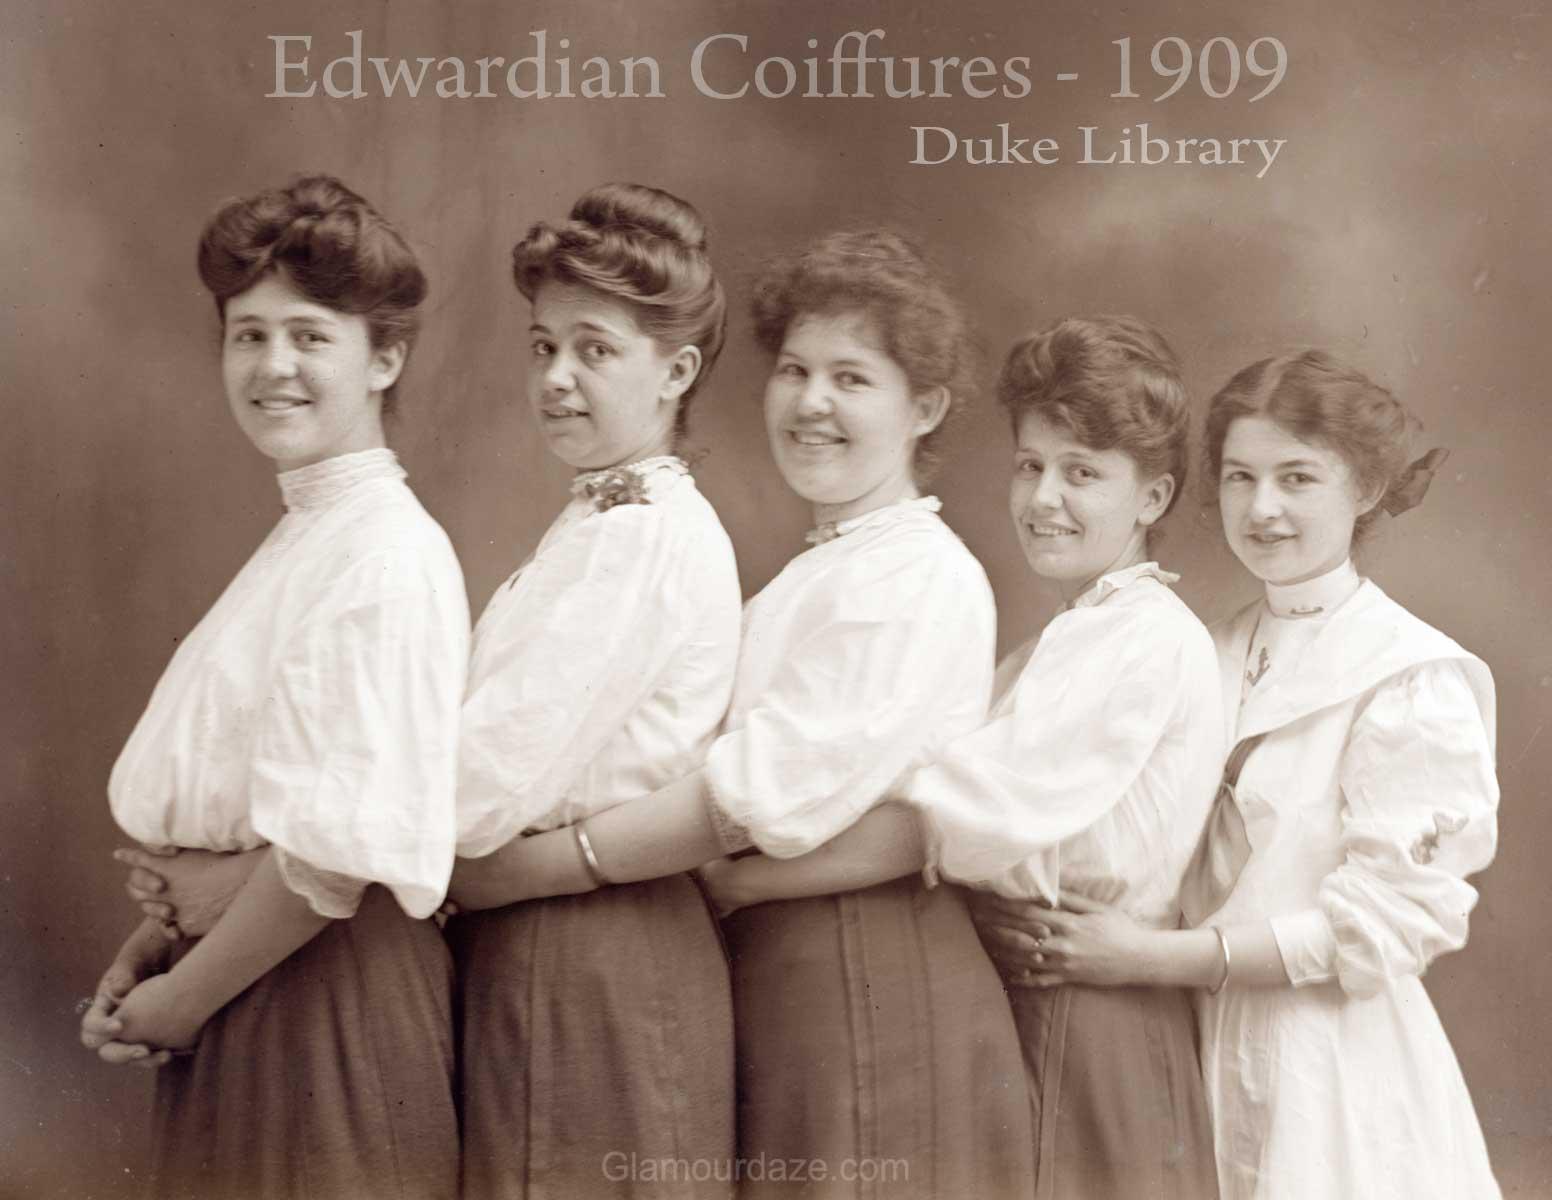 Superb Women Show The Latest Pompadour Hairstyles 1909 Glamourdaze Short Hairstyles For Black Women Fulllsitofus